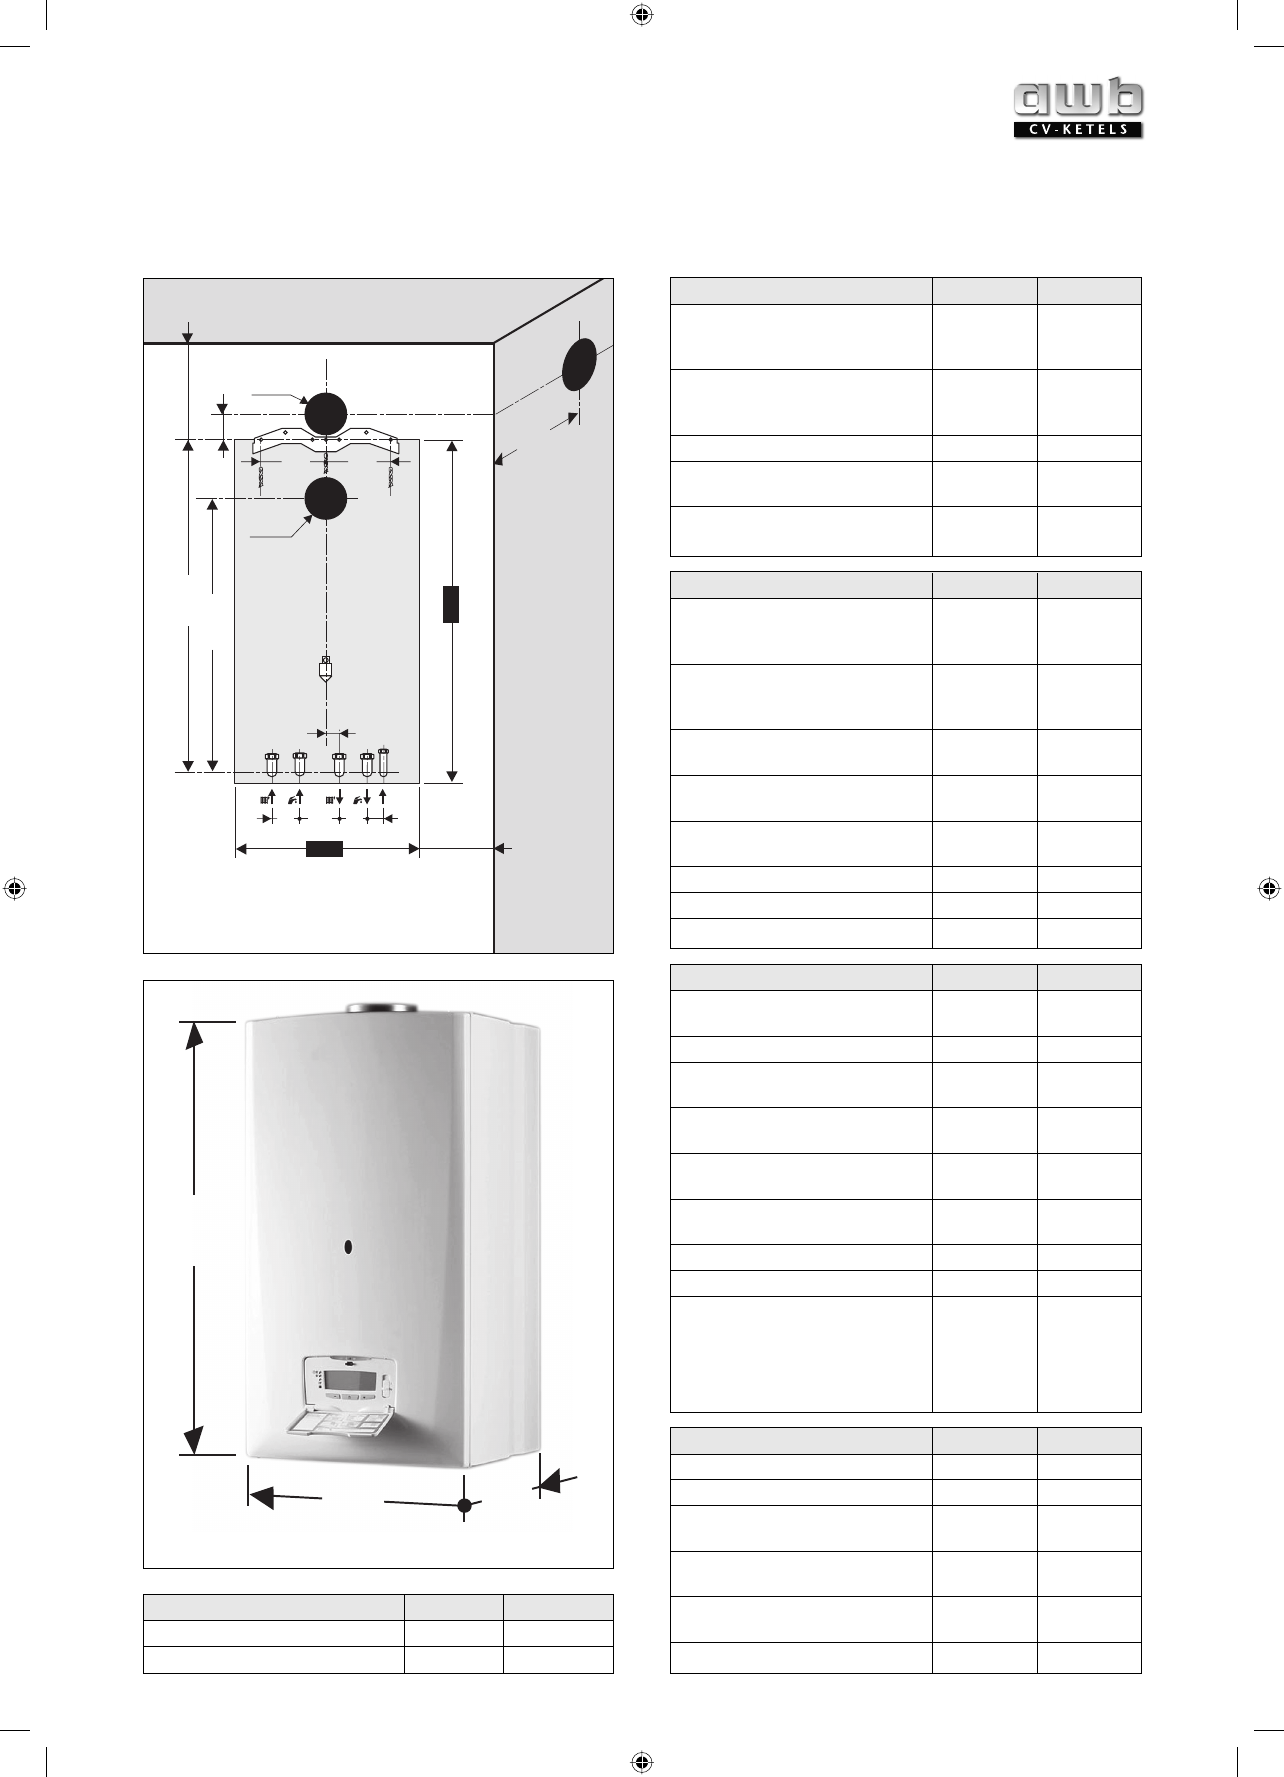 Super Handleiding AWB Thermomaster VR 24T (pagina 8 van 24) (Nederlands) XC-18